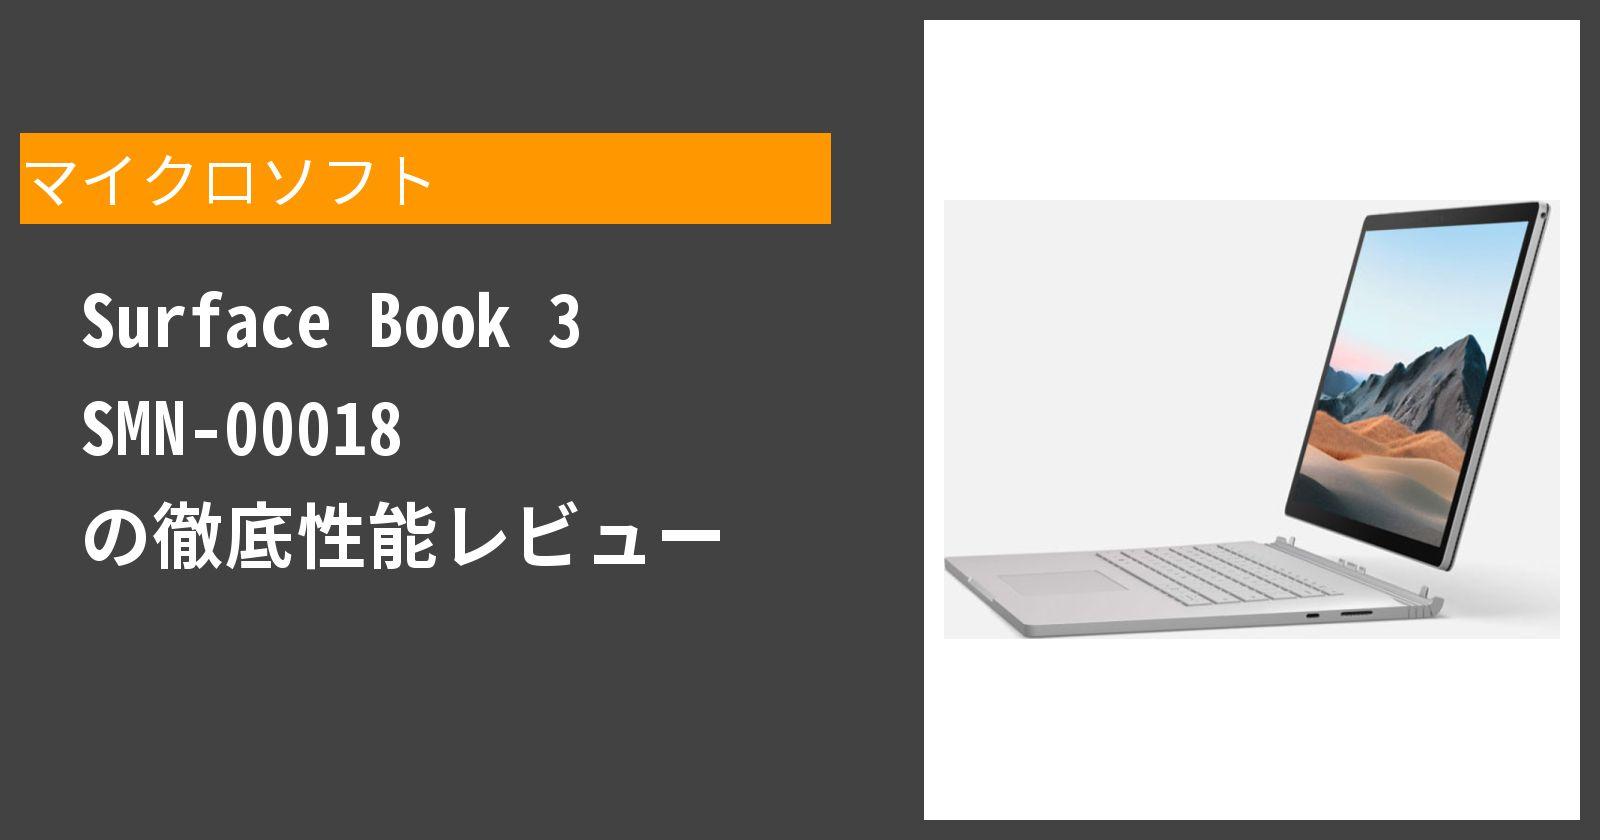 Surface Book 3 SMN-00018 の徹底性能レビュー